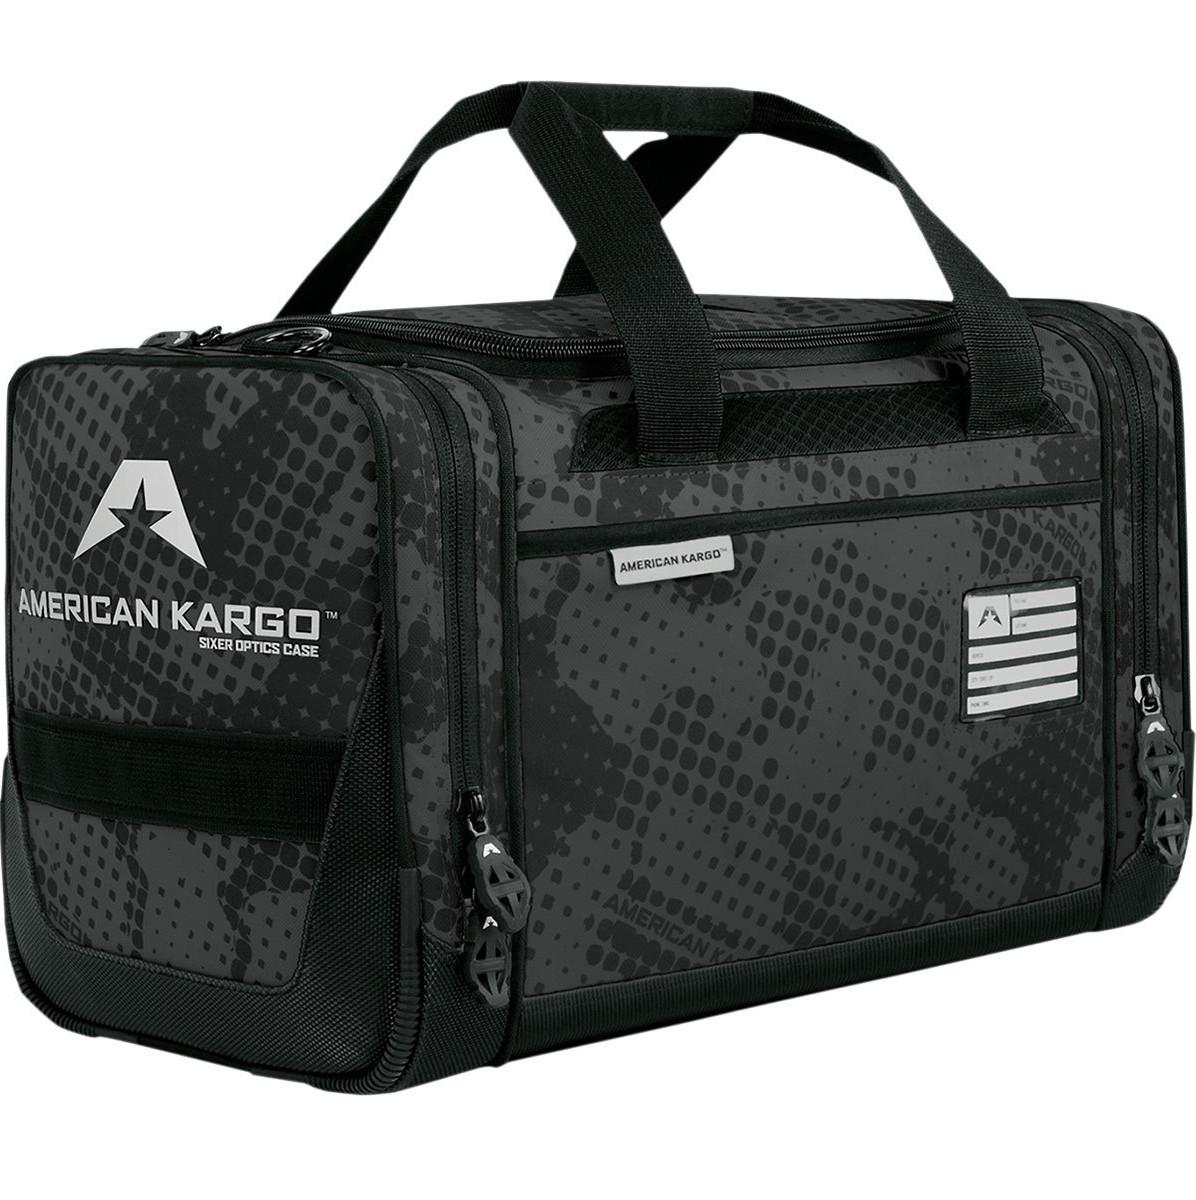 American Kargo Sixer Goggle Case  2014-american-kargo-sixer-goggle-case-mcss.jpg